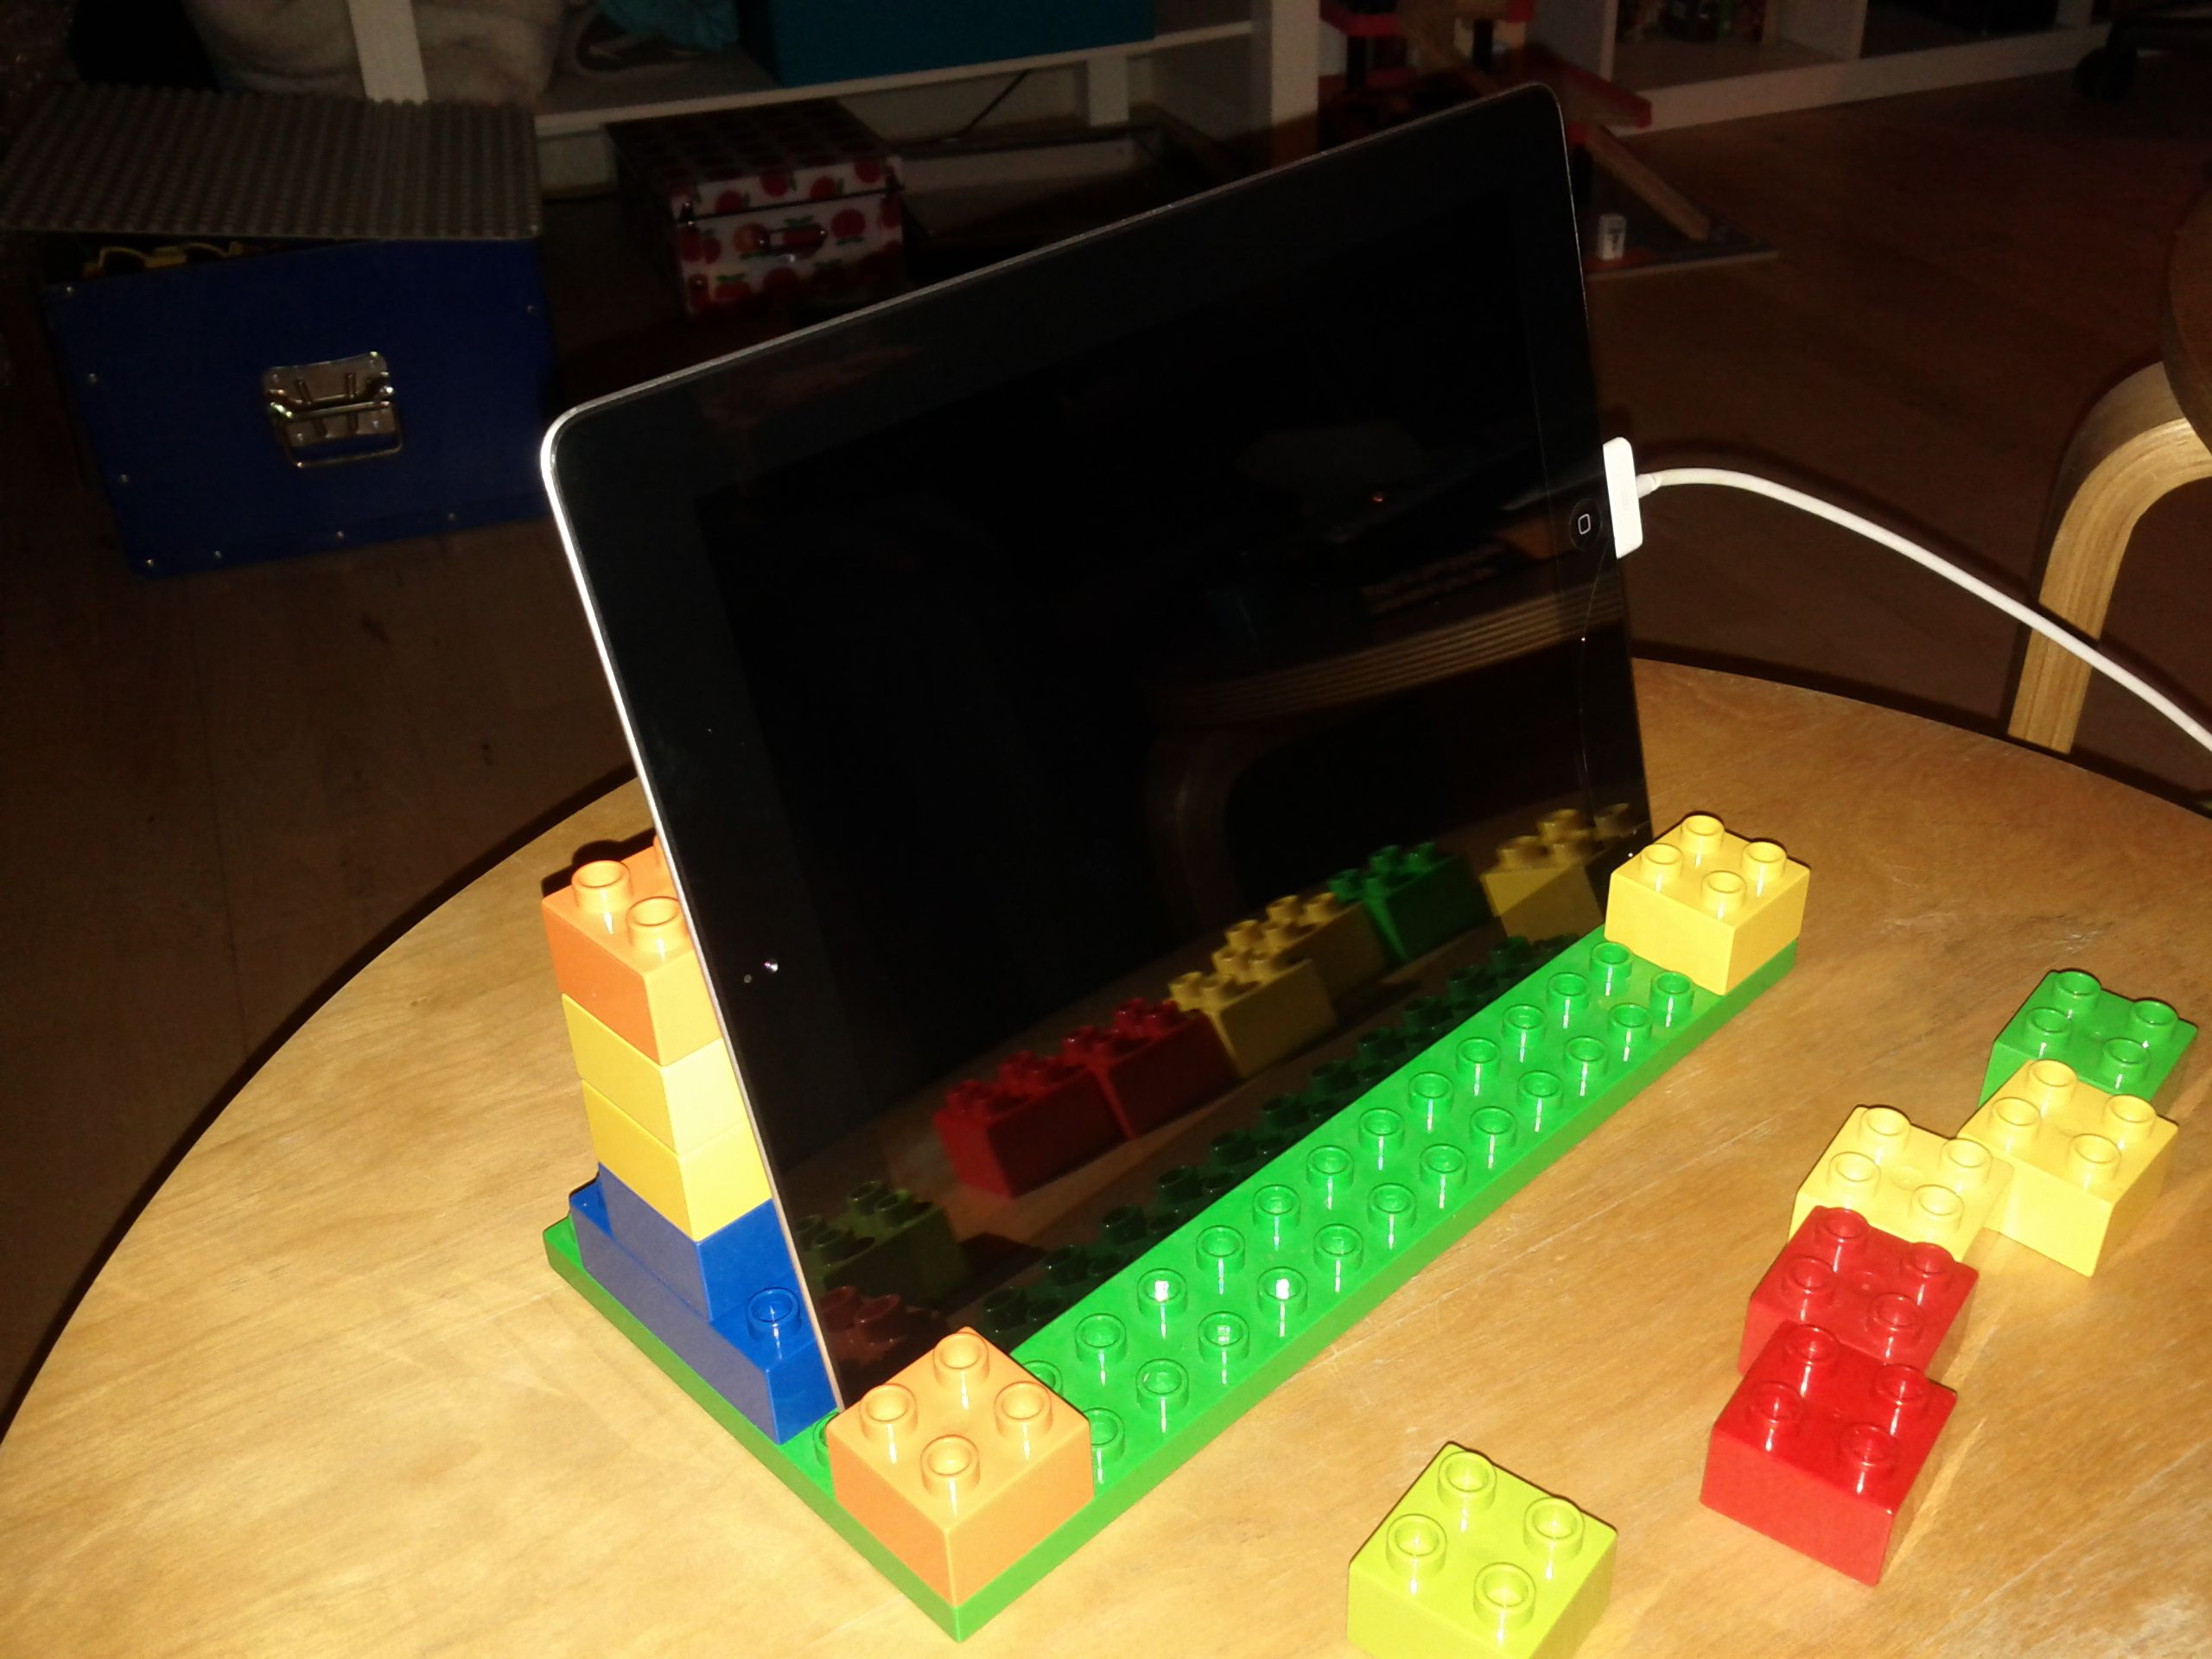 An iPad stand made out of Duplo bricks   Ipad stand, Scandinavian toys, Diy  ipad stand